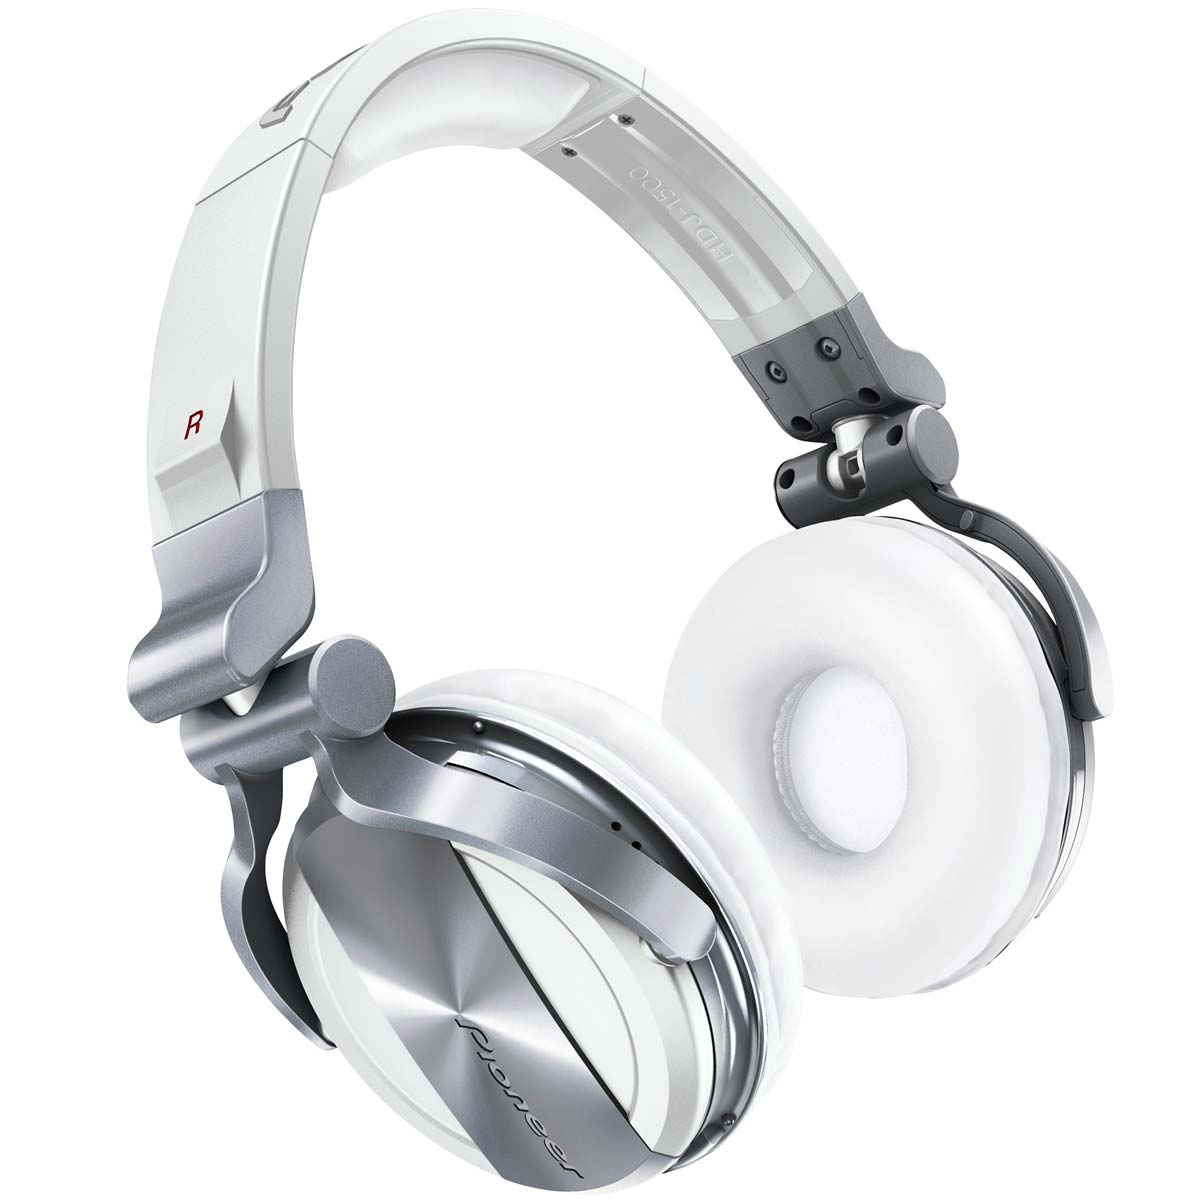 HDJ1500 - Fone de Ouvido Over-ear Branco HDJ 1500 - Pioneer